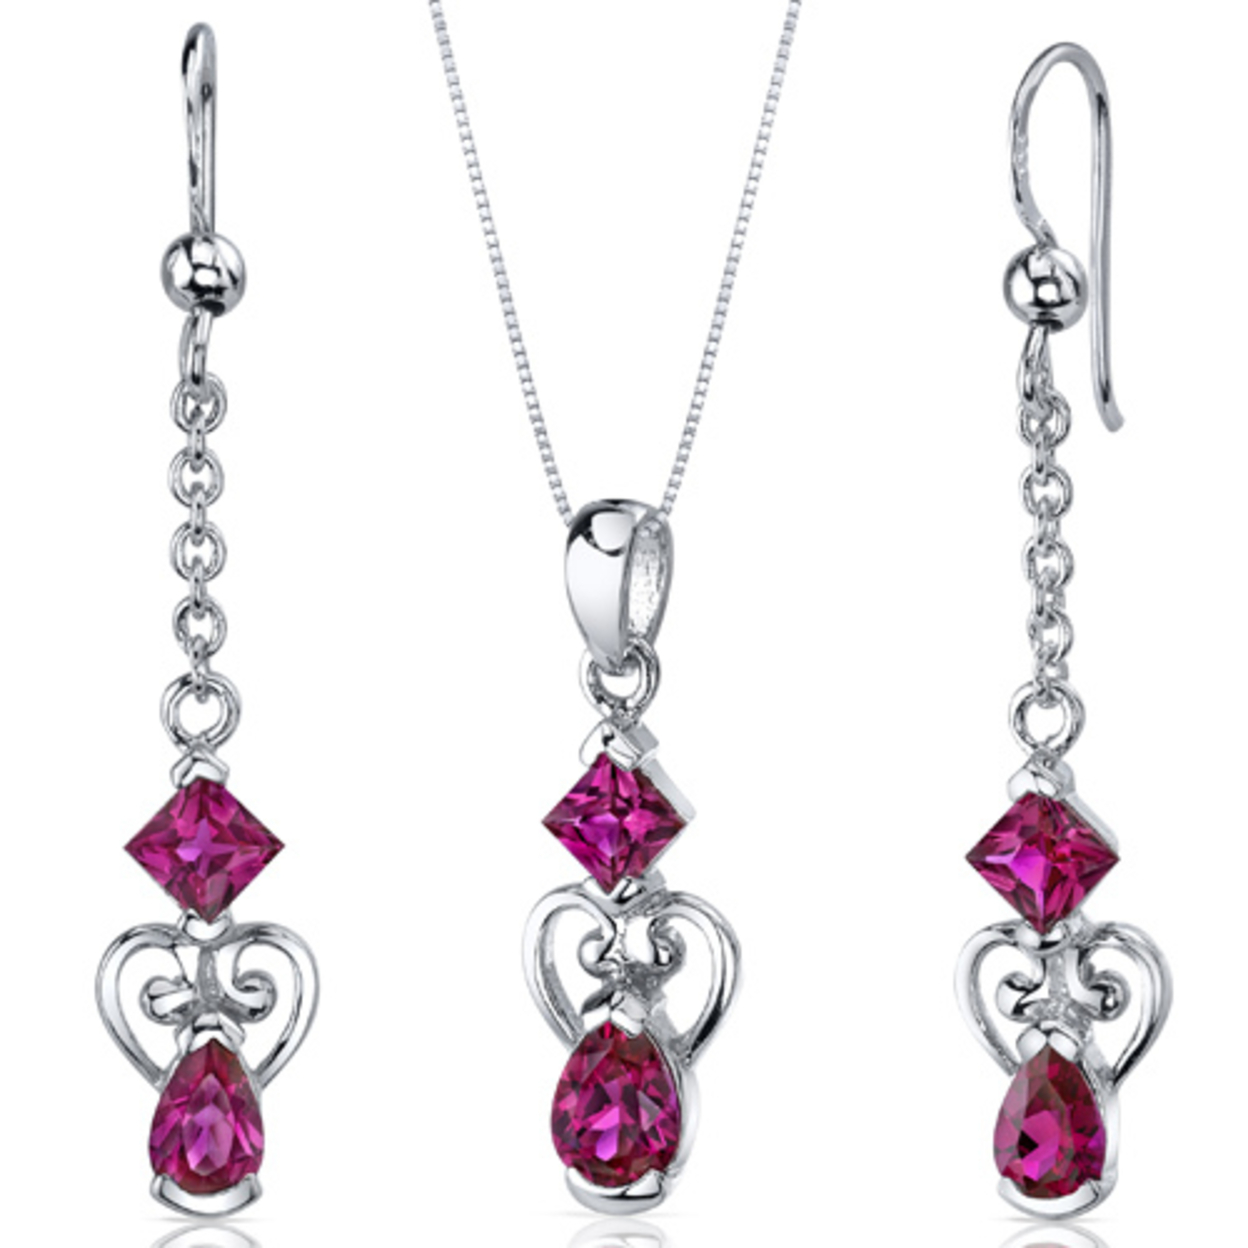 2 Stone Heart Design 2.75 Carats Pear Shape Sterling Silver Ruby Pendant Earrings Set Style Ss3652